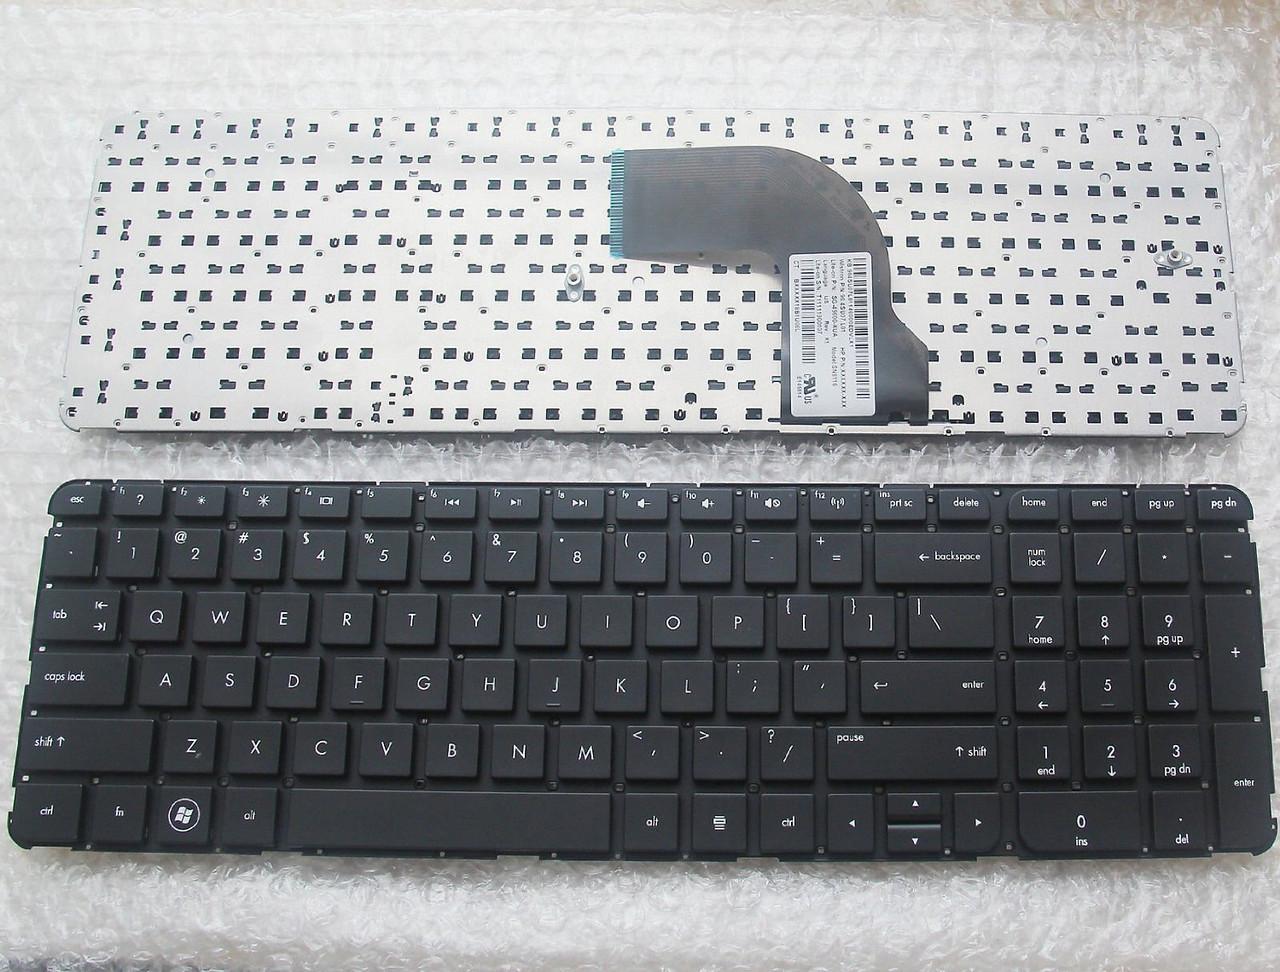 Клавиатура для ноутбука HP (Pavilion: dv7-7000; Envy: m7-1000) rus, black, without frame